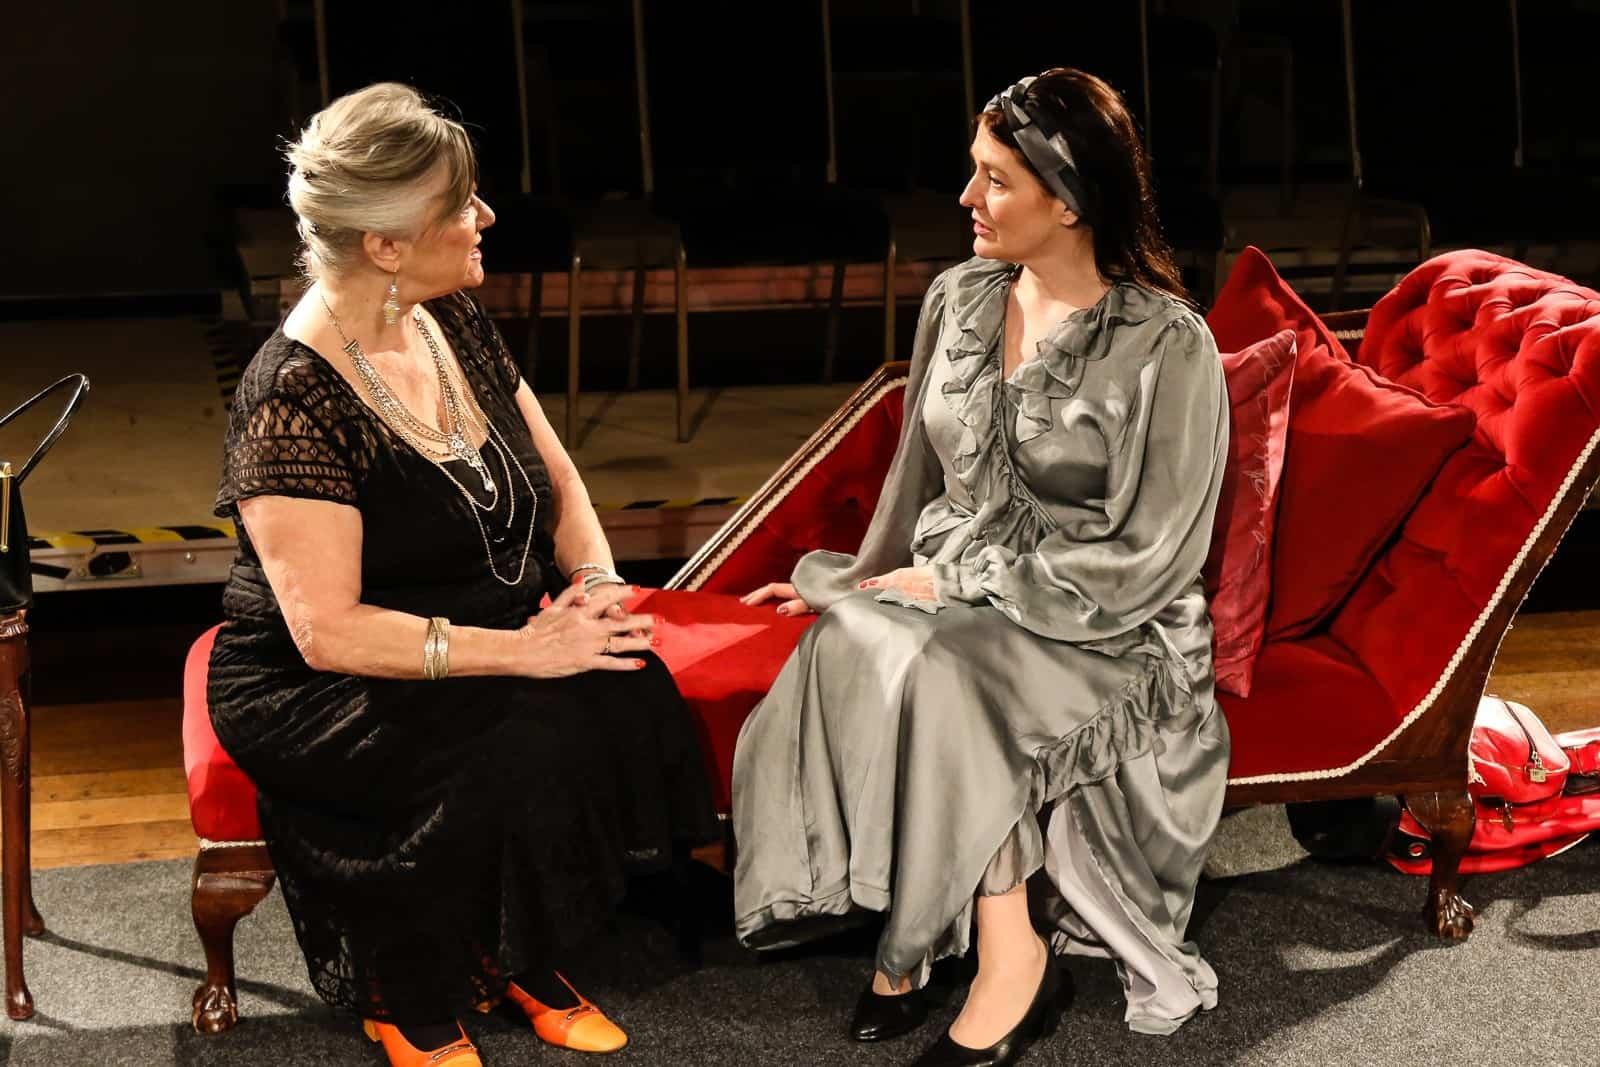 Marie Cooper actor as Anna Mary Conklin in Come into the Garden, Maud